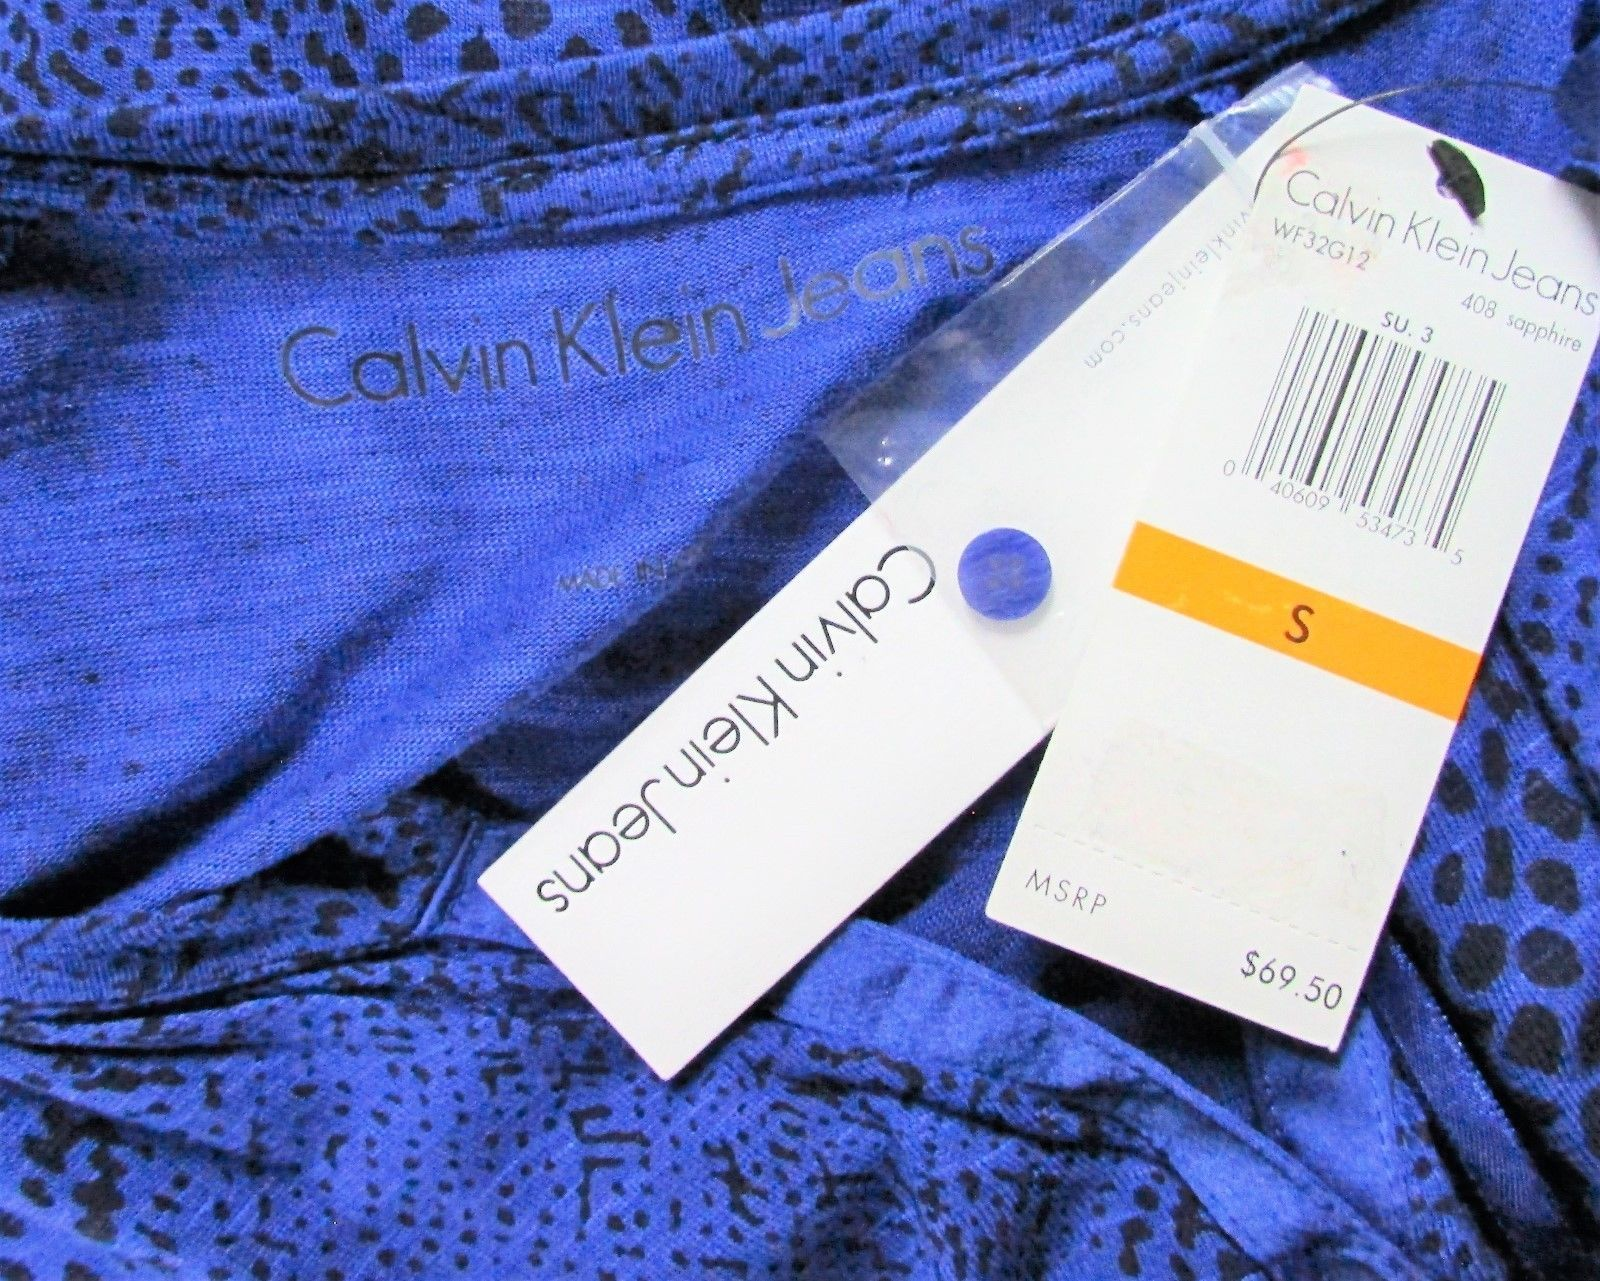 Calvin Klein Blue and Black Animal Print Shirt Shif Dress NWT Sz S,M  MSRP: $69.